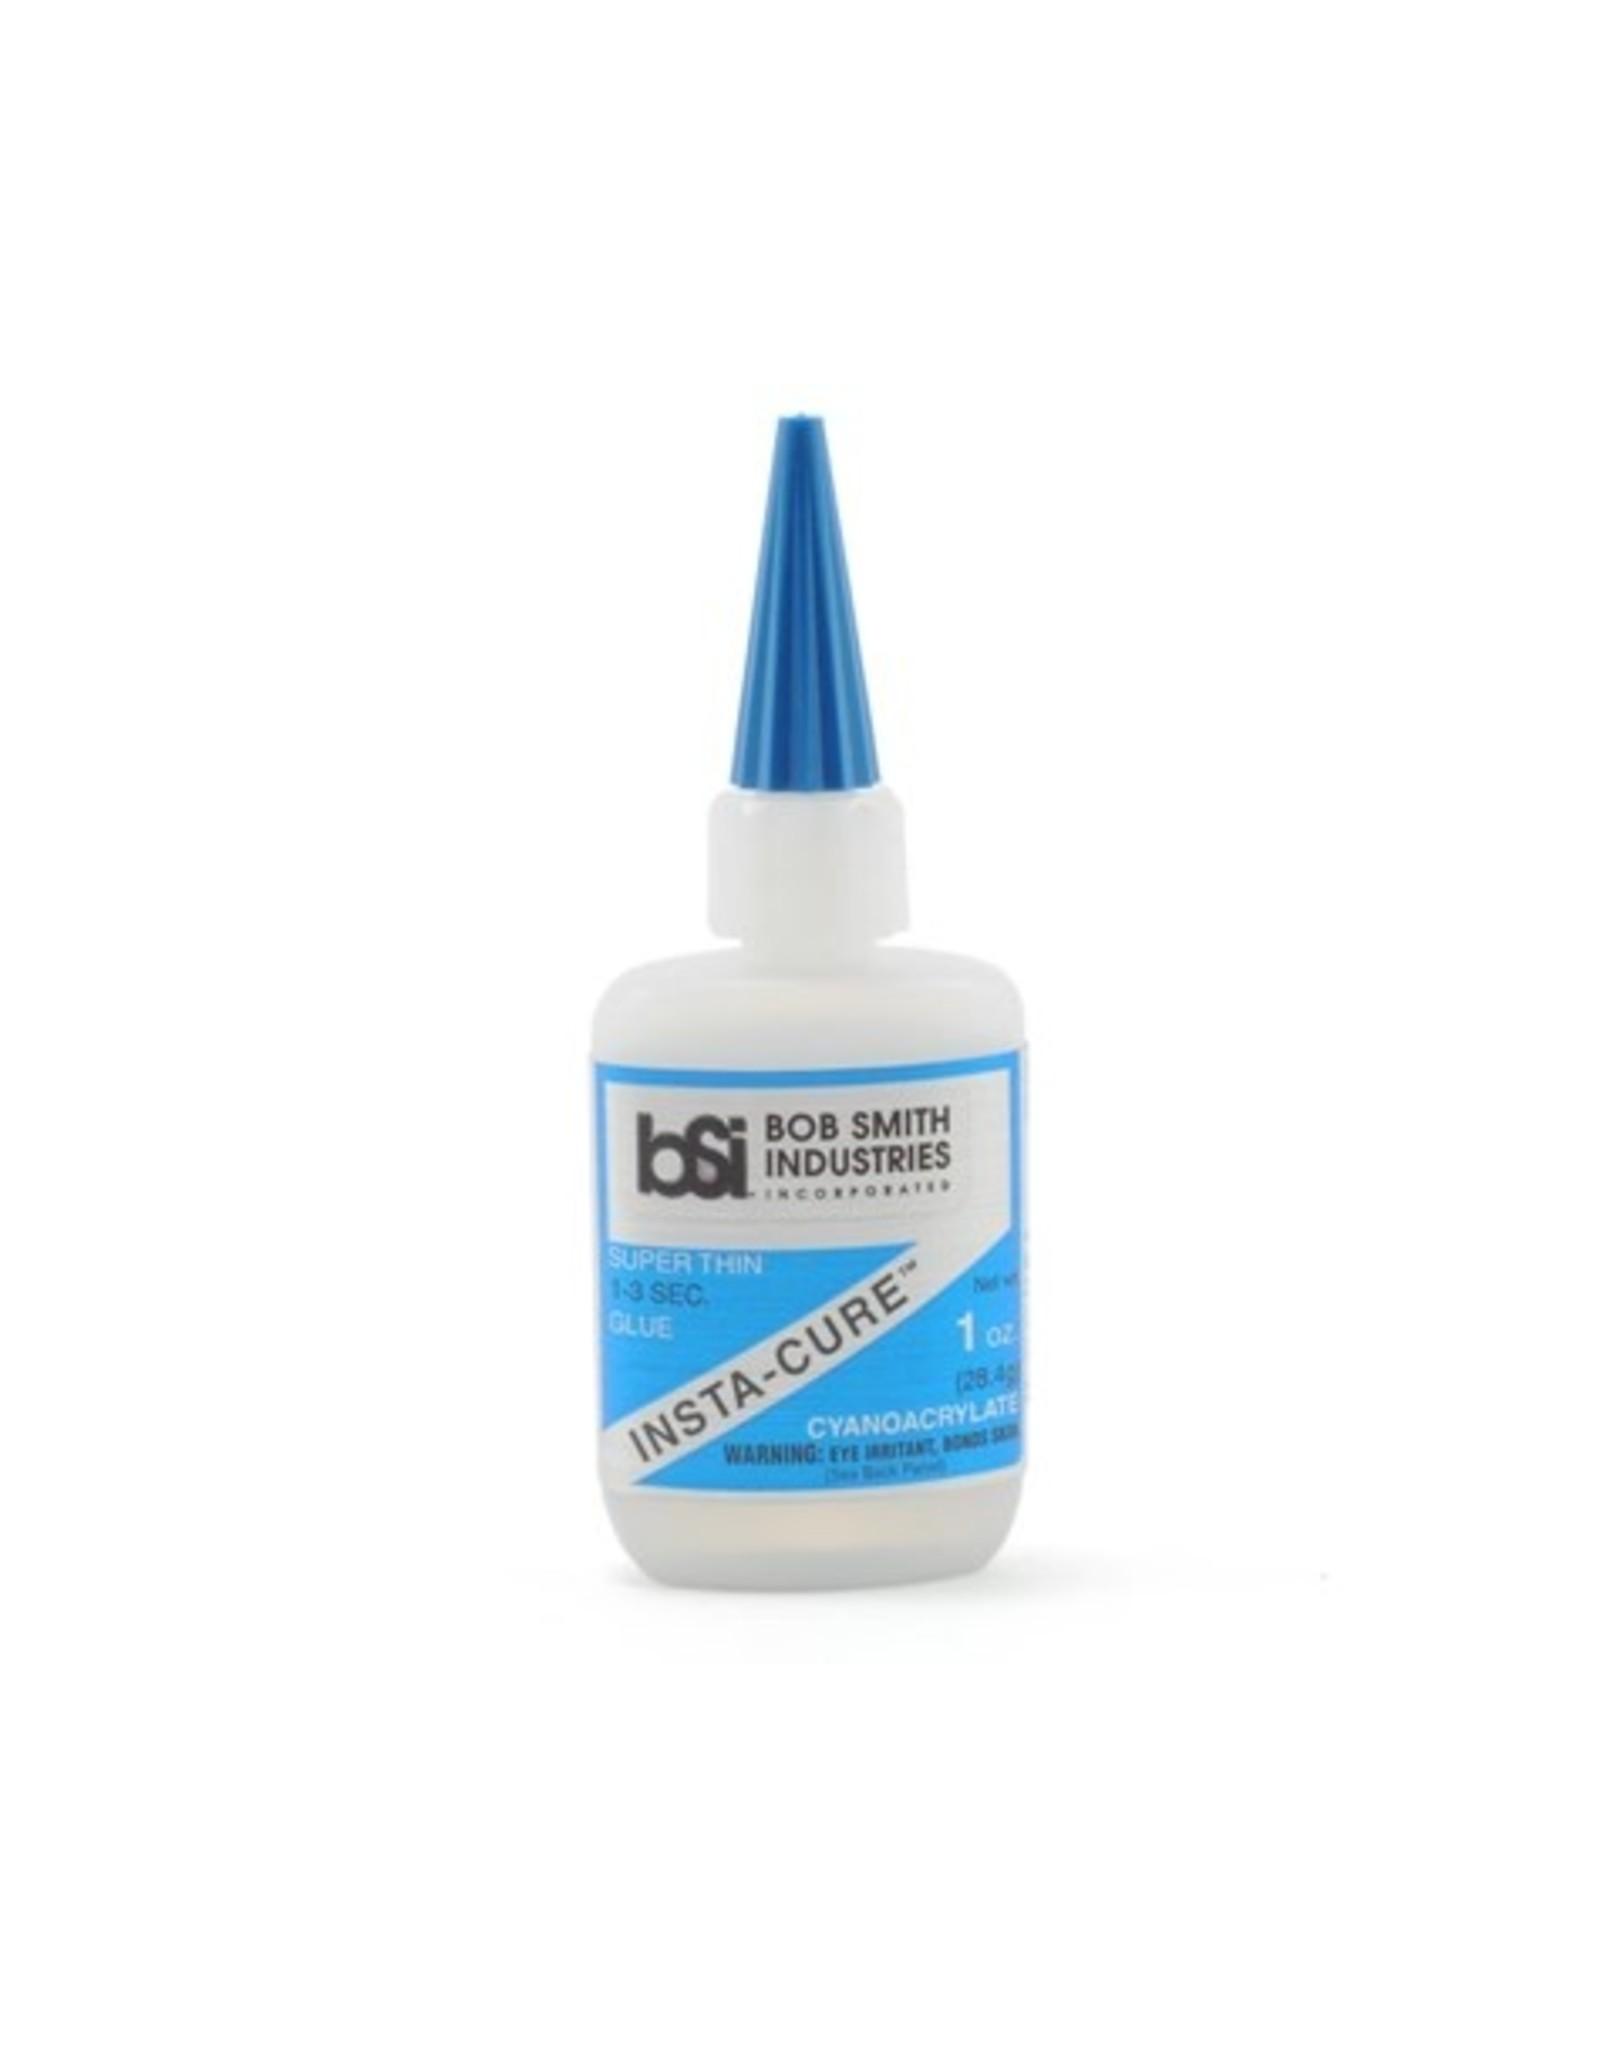 Bob Smith Industries BSI102 - Insta-Cure (1oz)